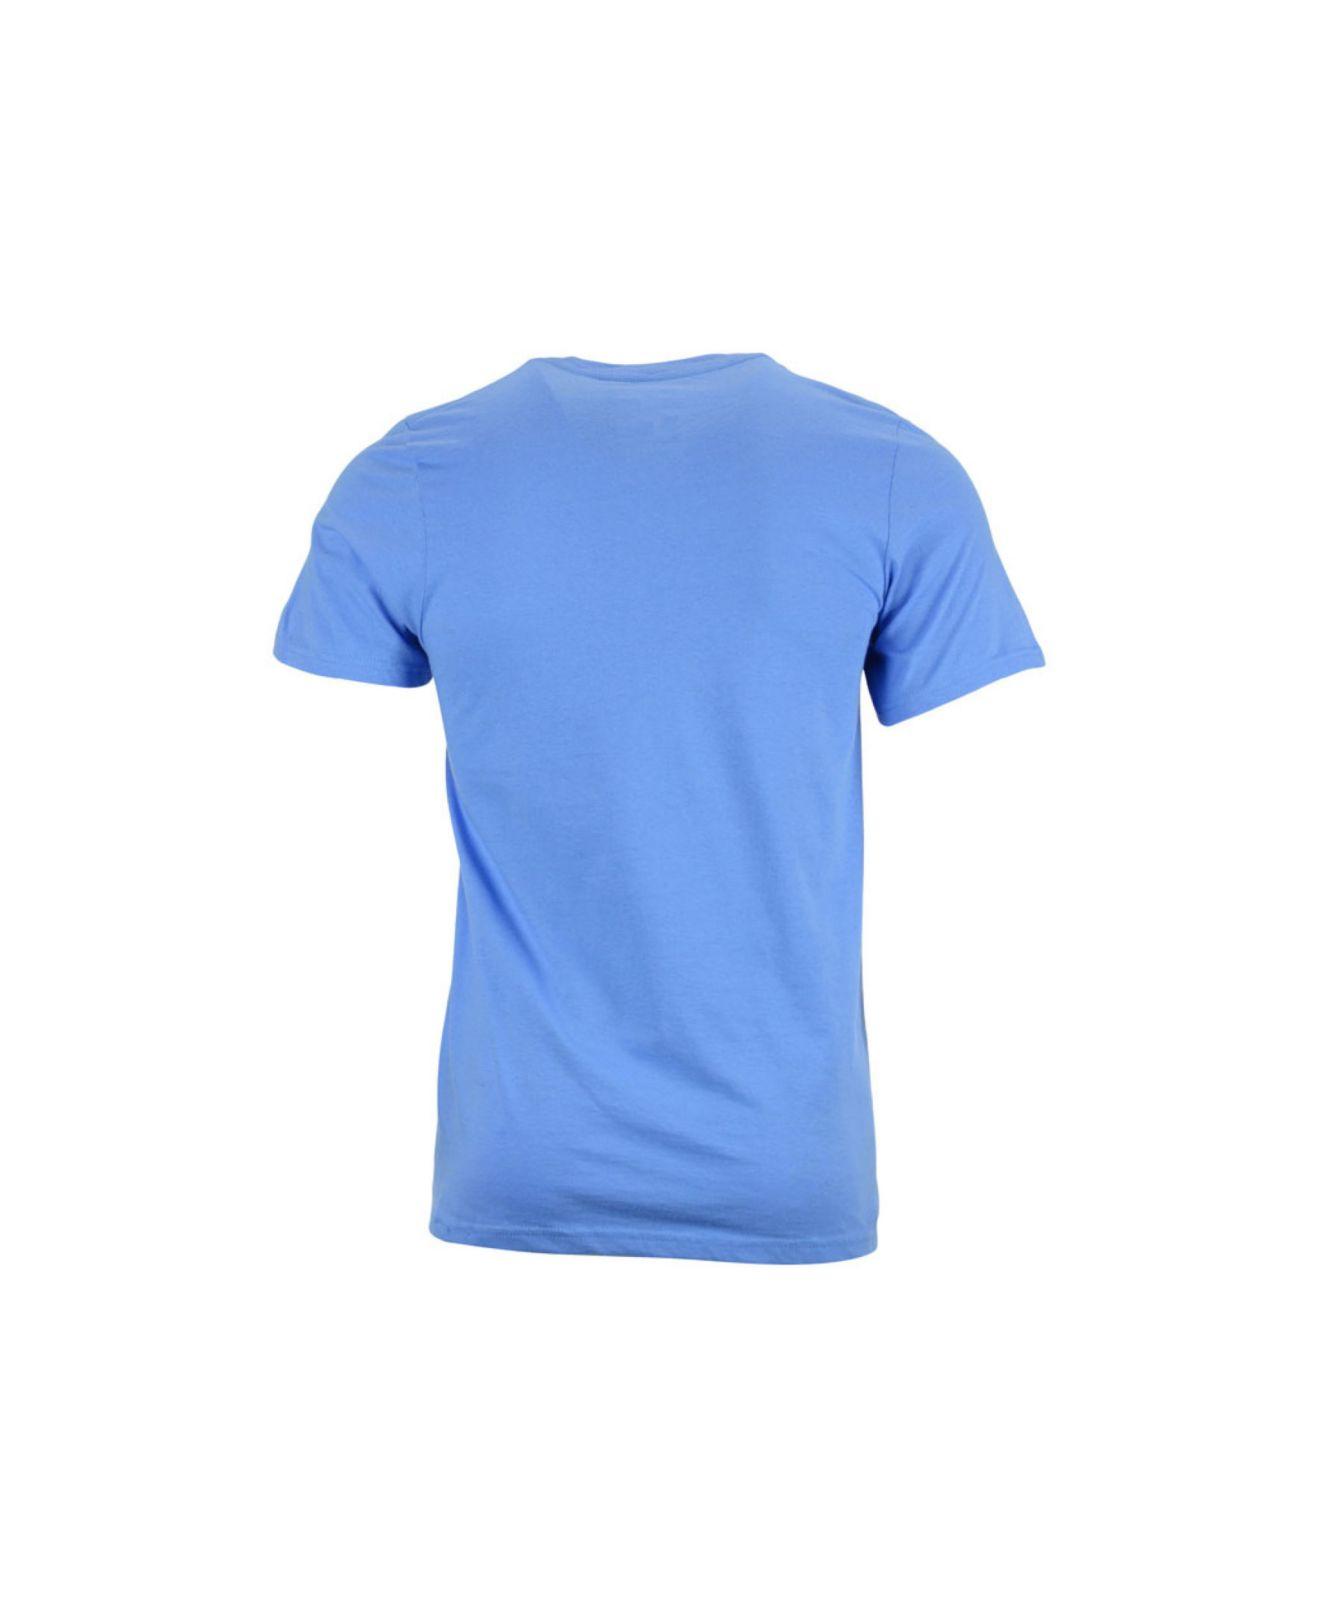 ada6d84c3fa Lyst - Adidas Originals Men s Short-sleeve Denver Nuggets Straight ...